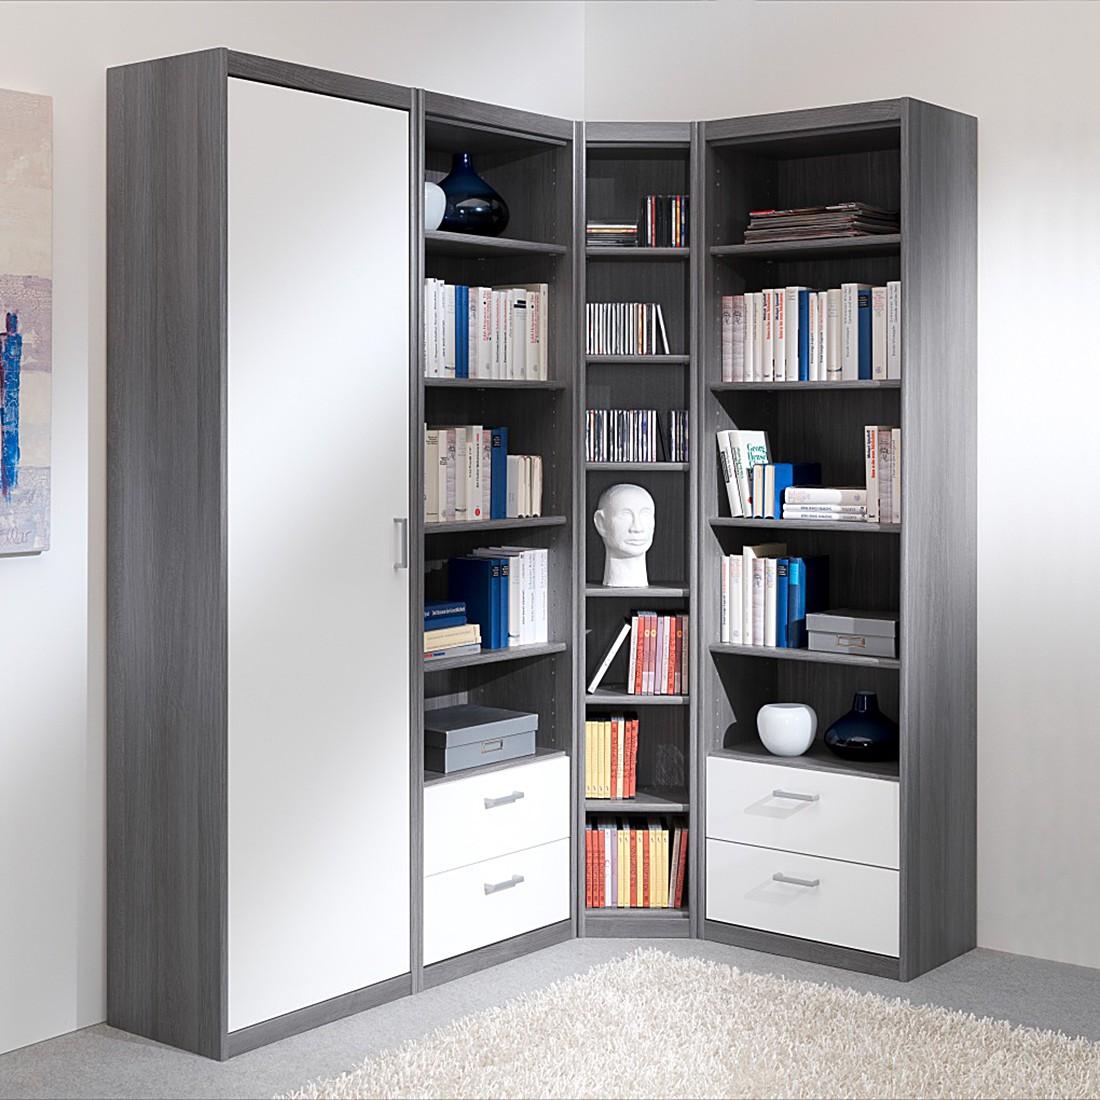 cd regal cdregal xxcm vollholz standregal kernbuche massiv broregal gelt cd regal cd dvd. Black Bedroom Furniture Sets. Home Design Ideas